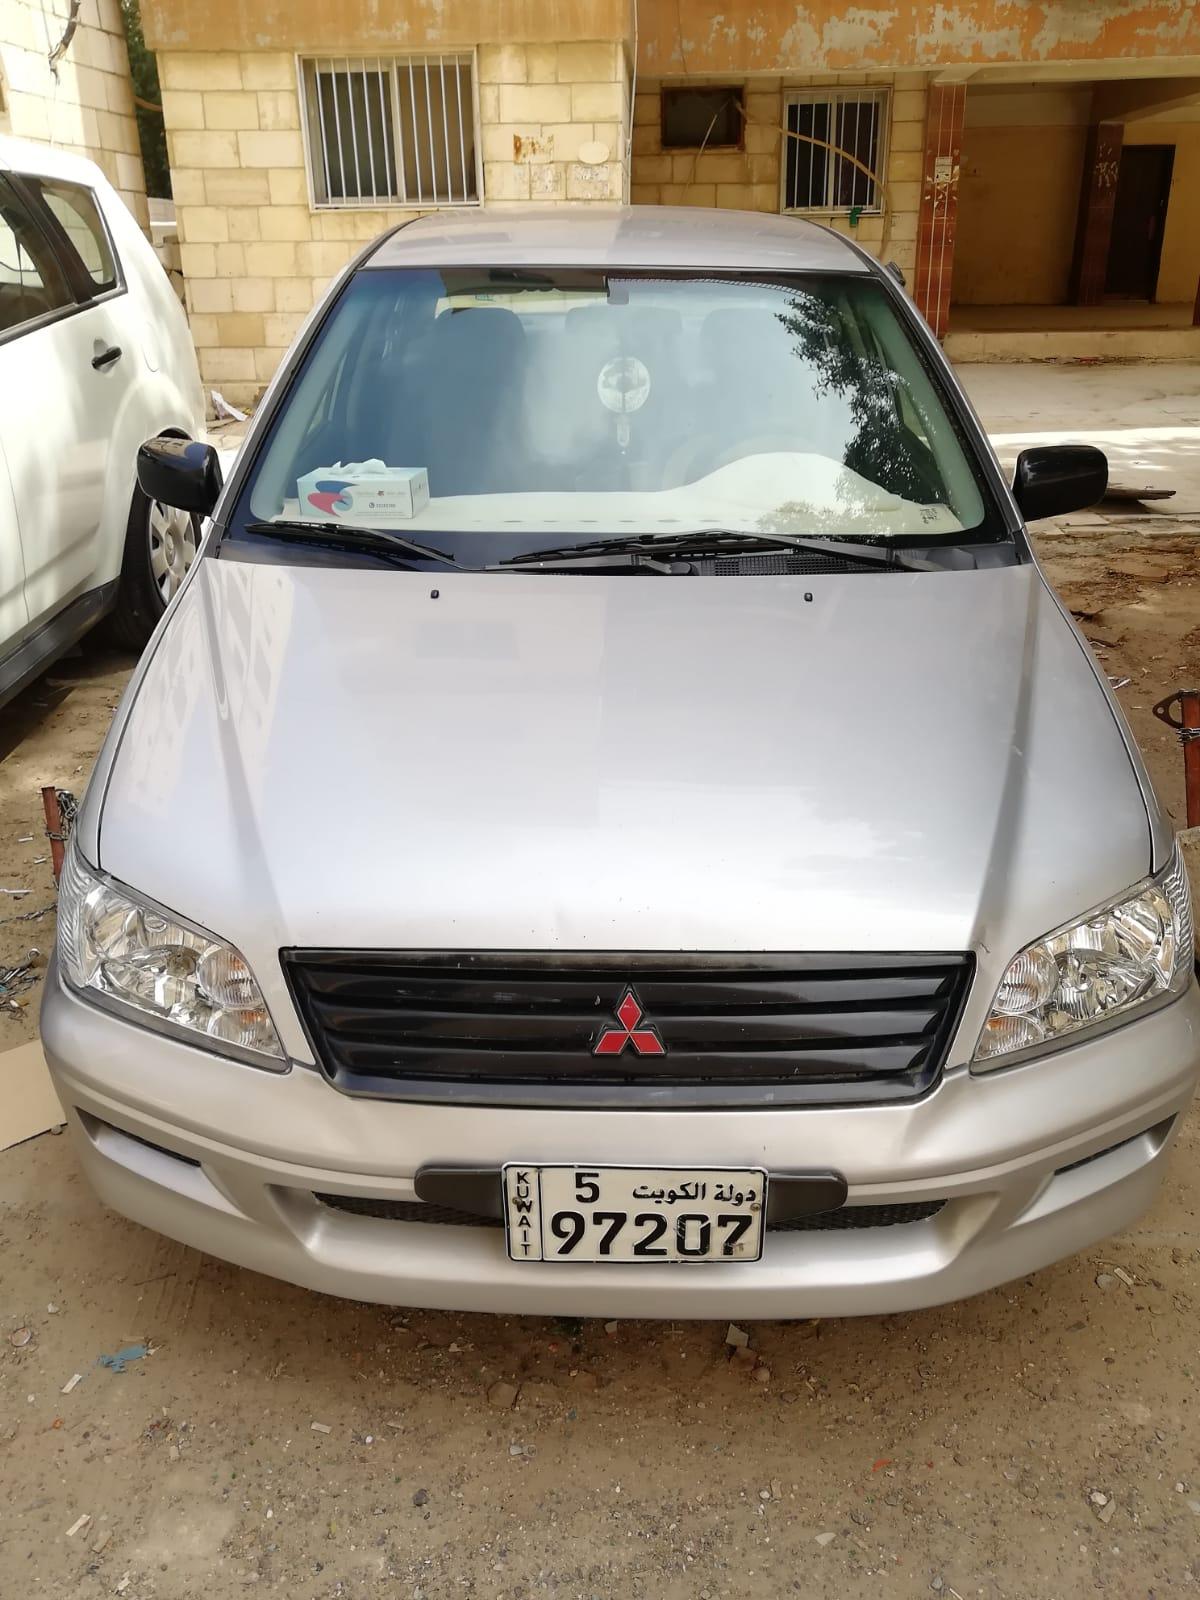 Mitsubishi Lancer Model 2003 (Good Condition) For URGENT SALE